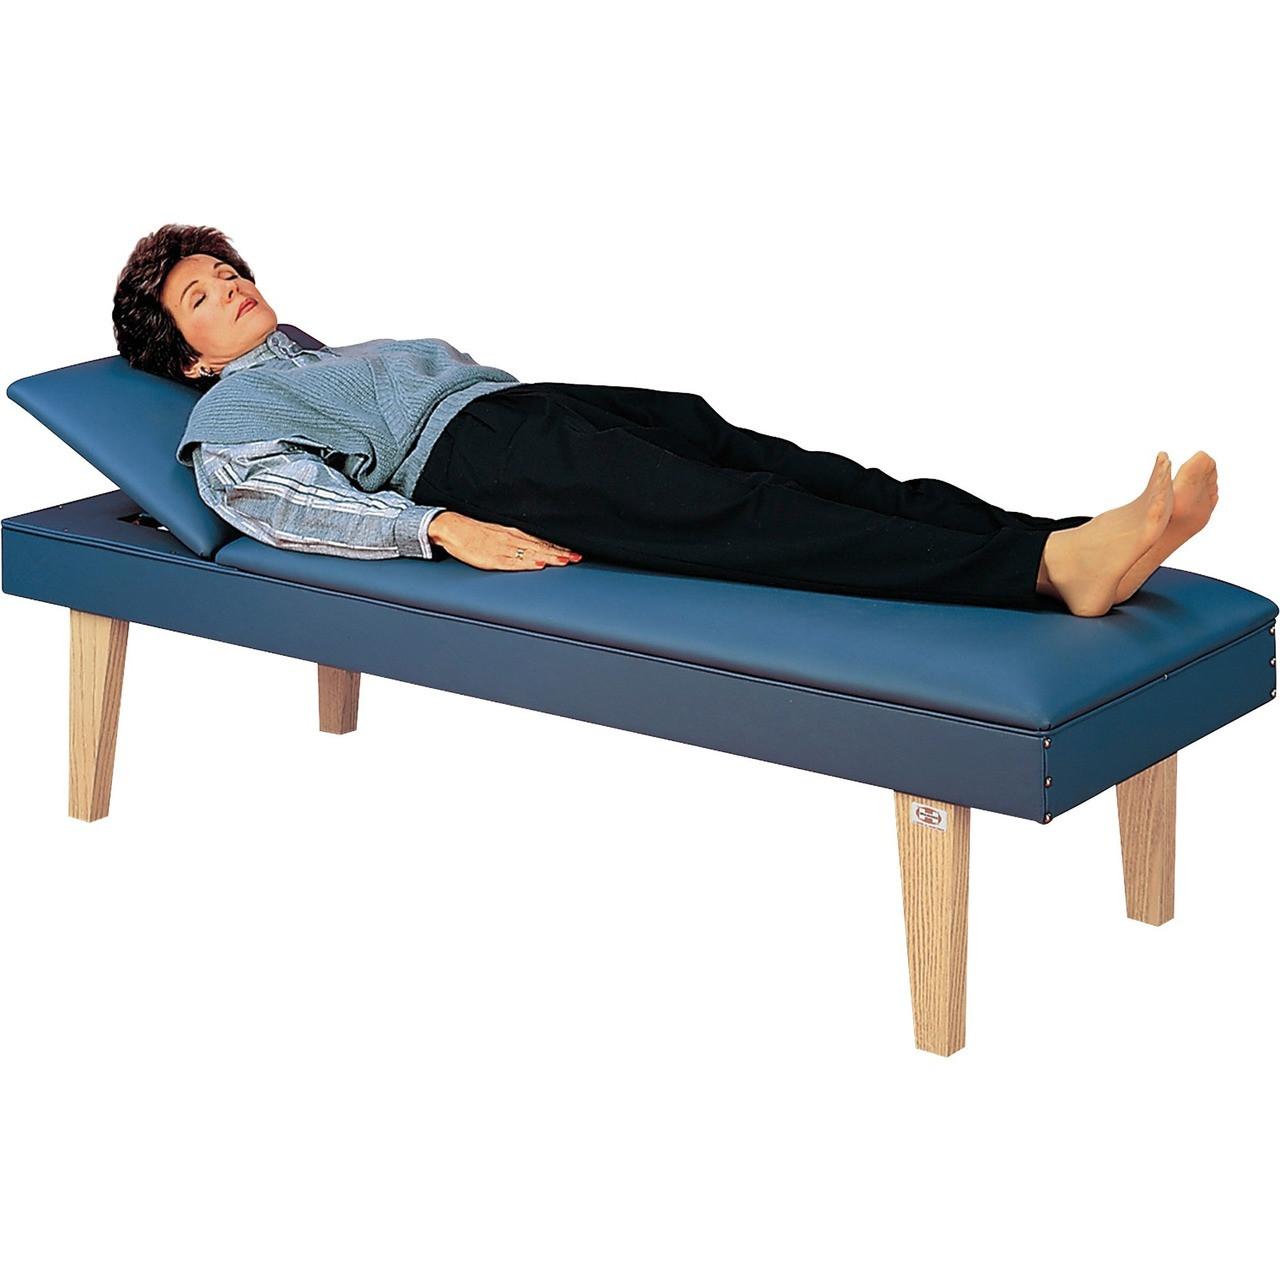 "Hausmann Recovery Couch, PVC-Free, 27""x72""x18"", Indigo Blue"